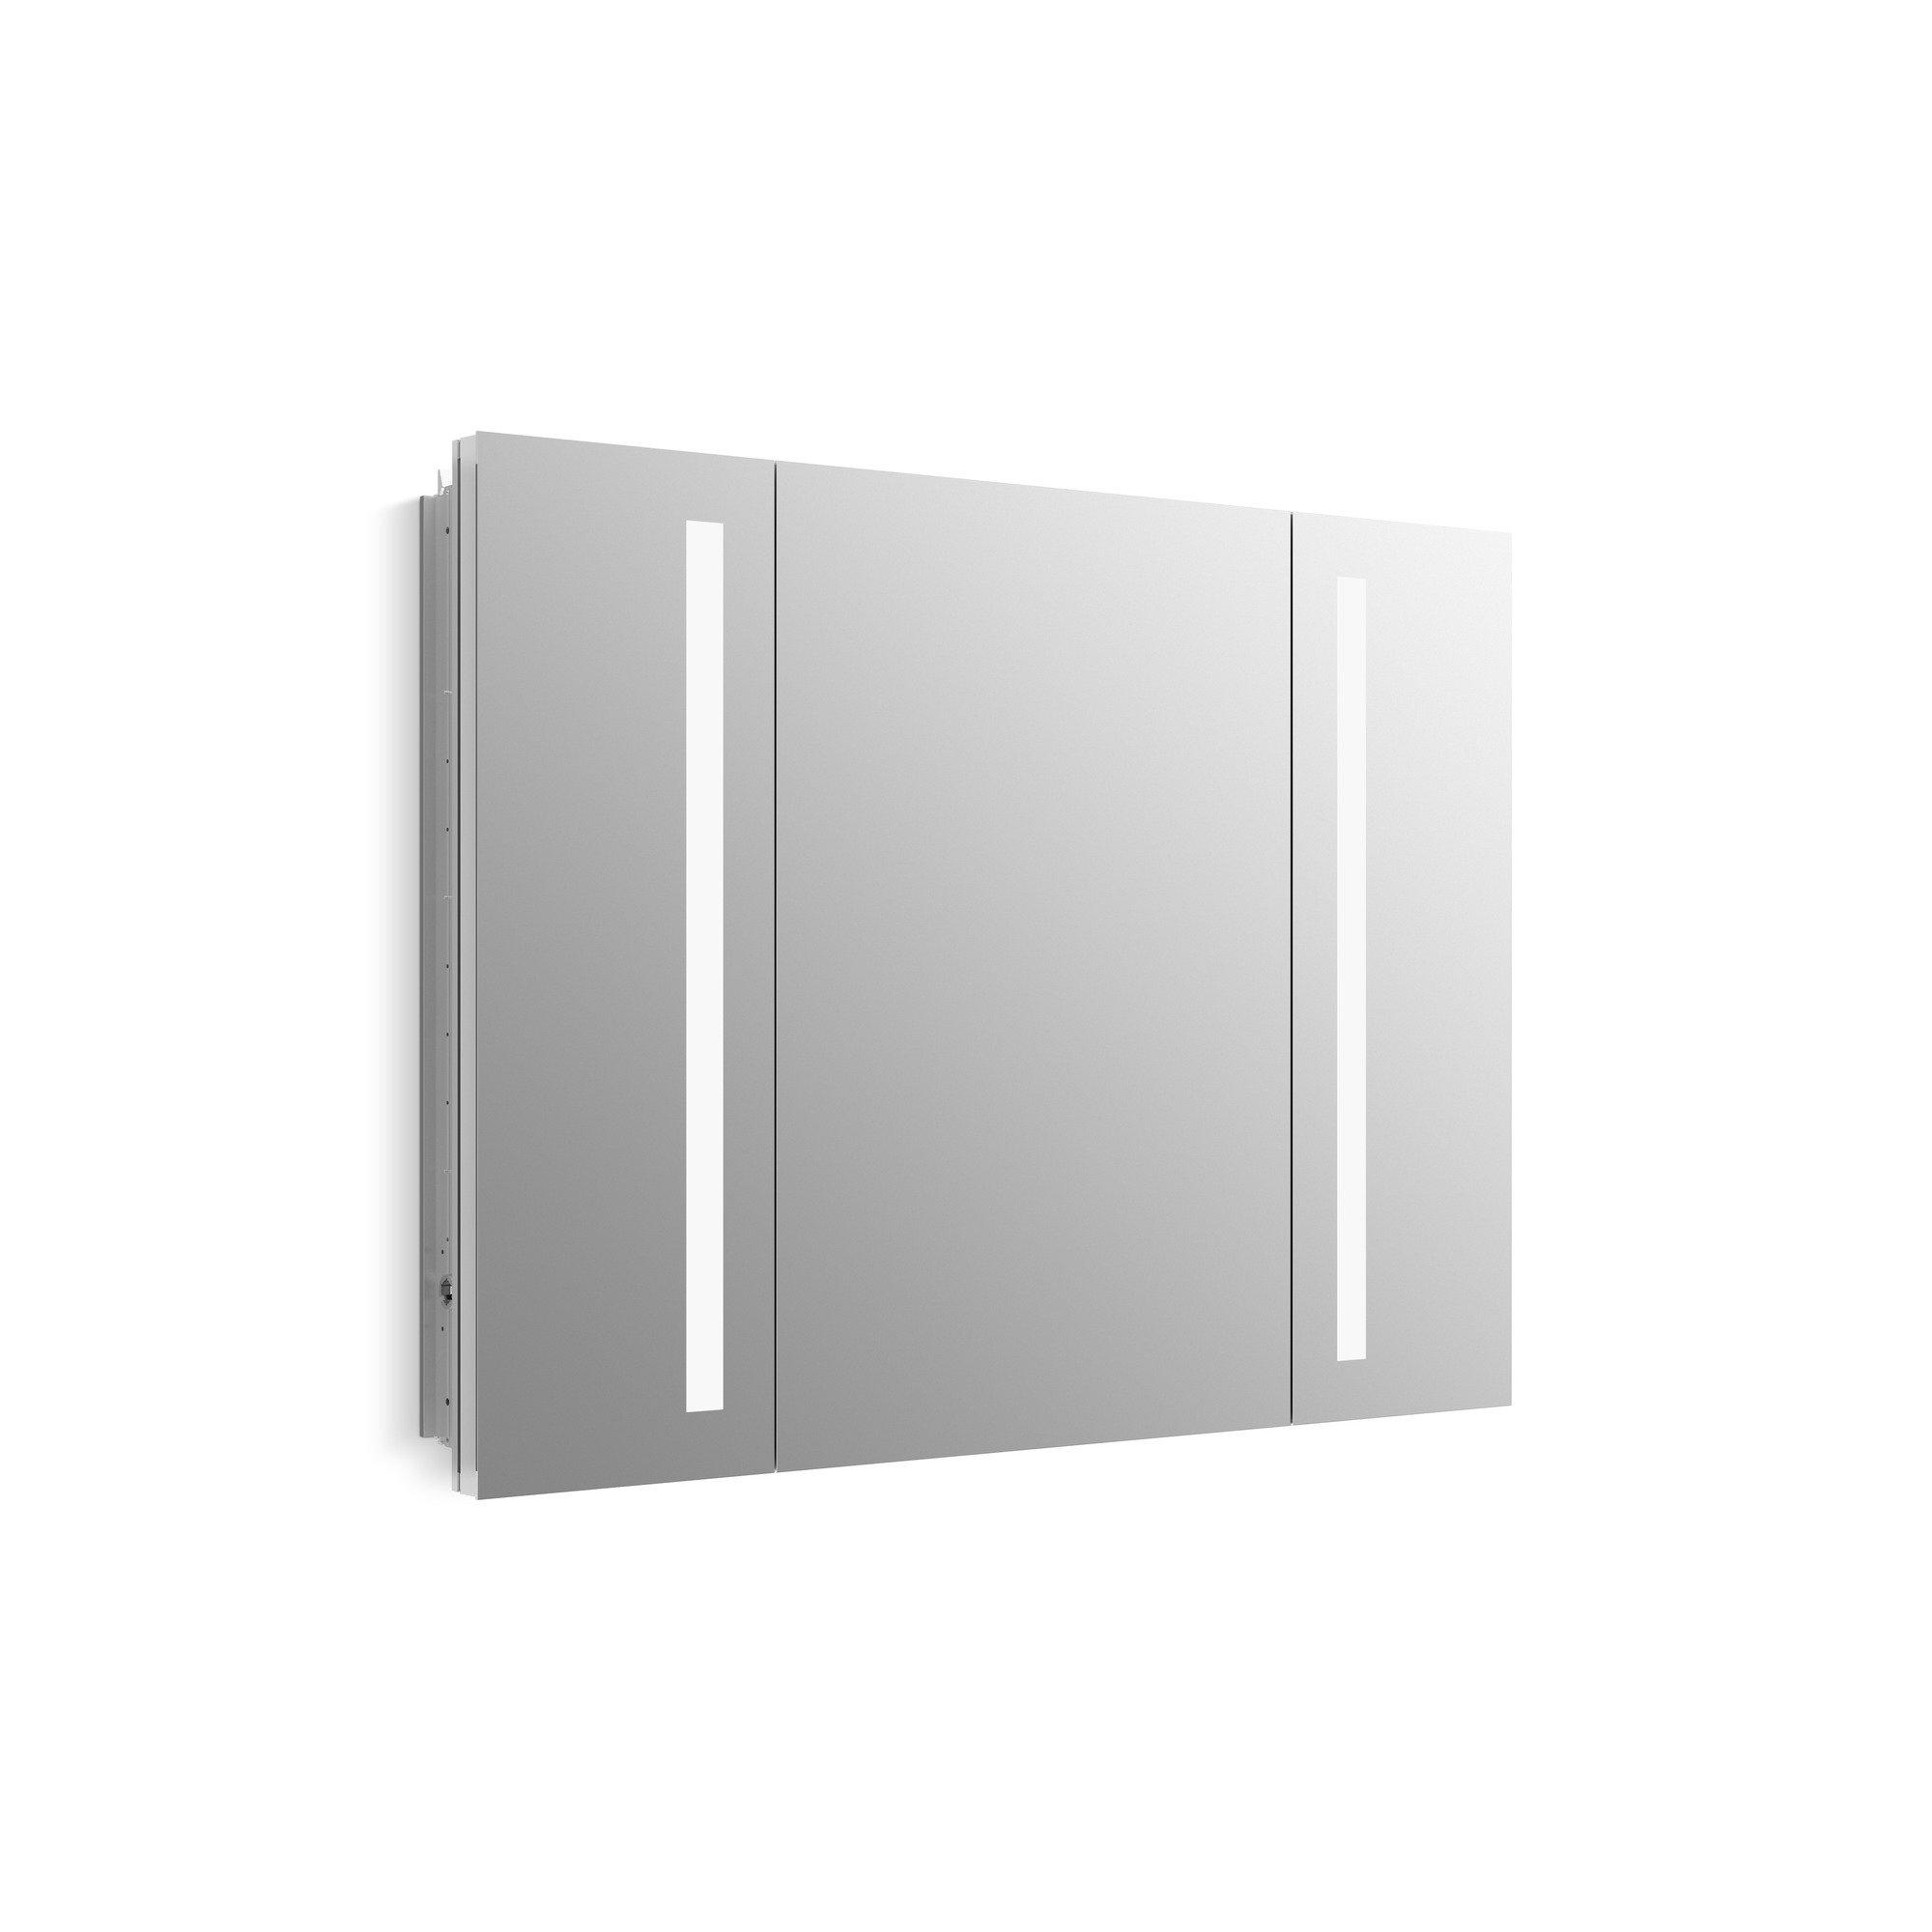 KOHLER 99011-TL-NA Verdera Lighted Medicine Cabinet, Aluminum, 40''x30''